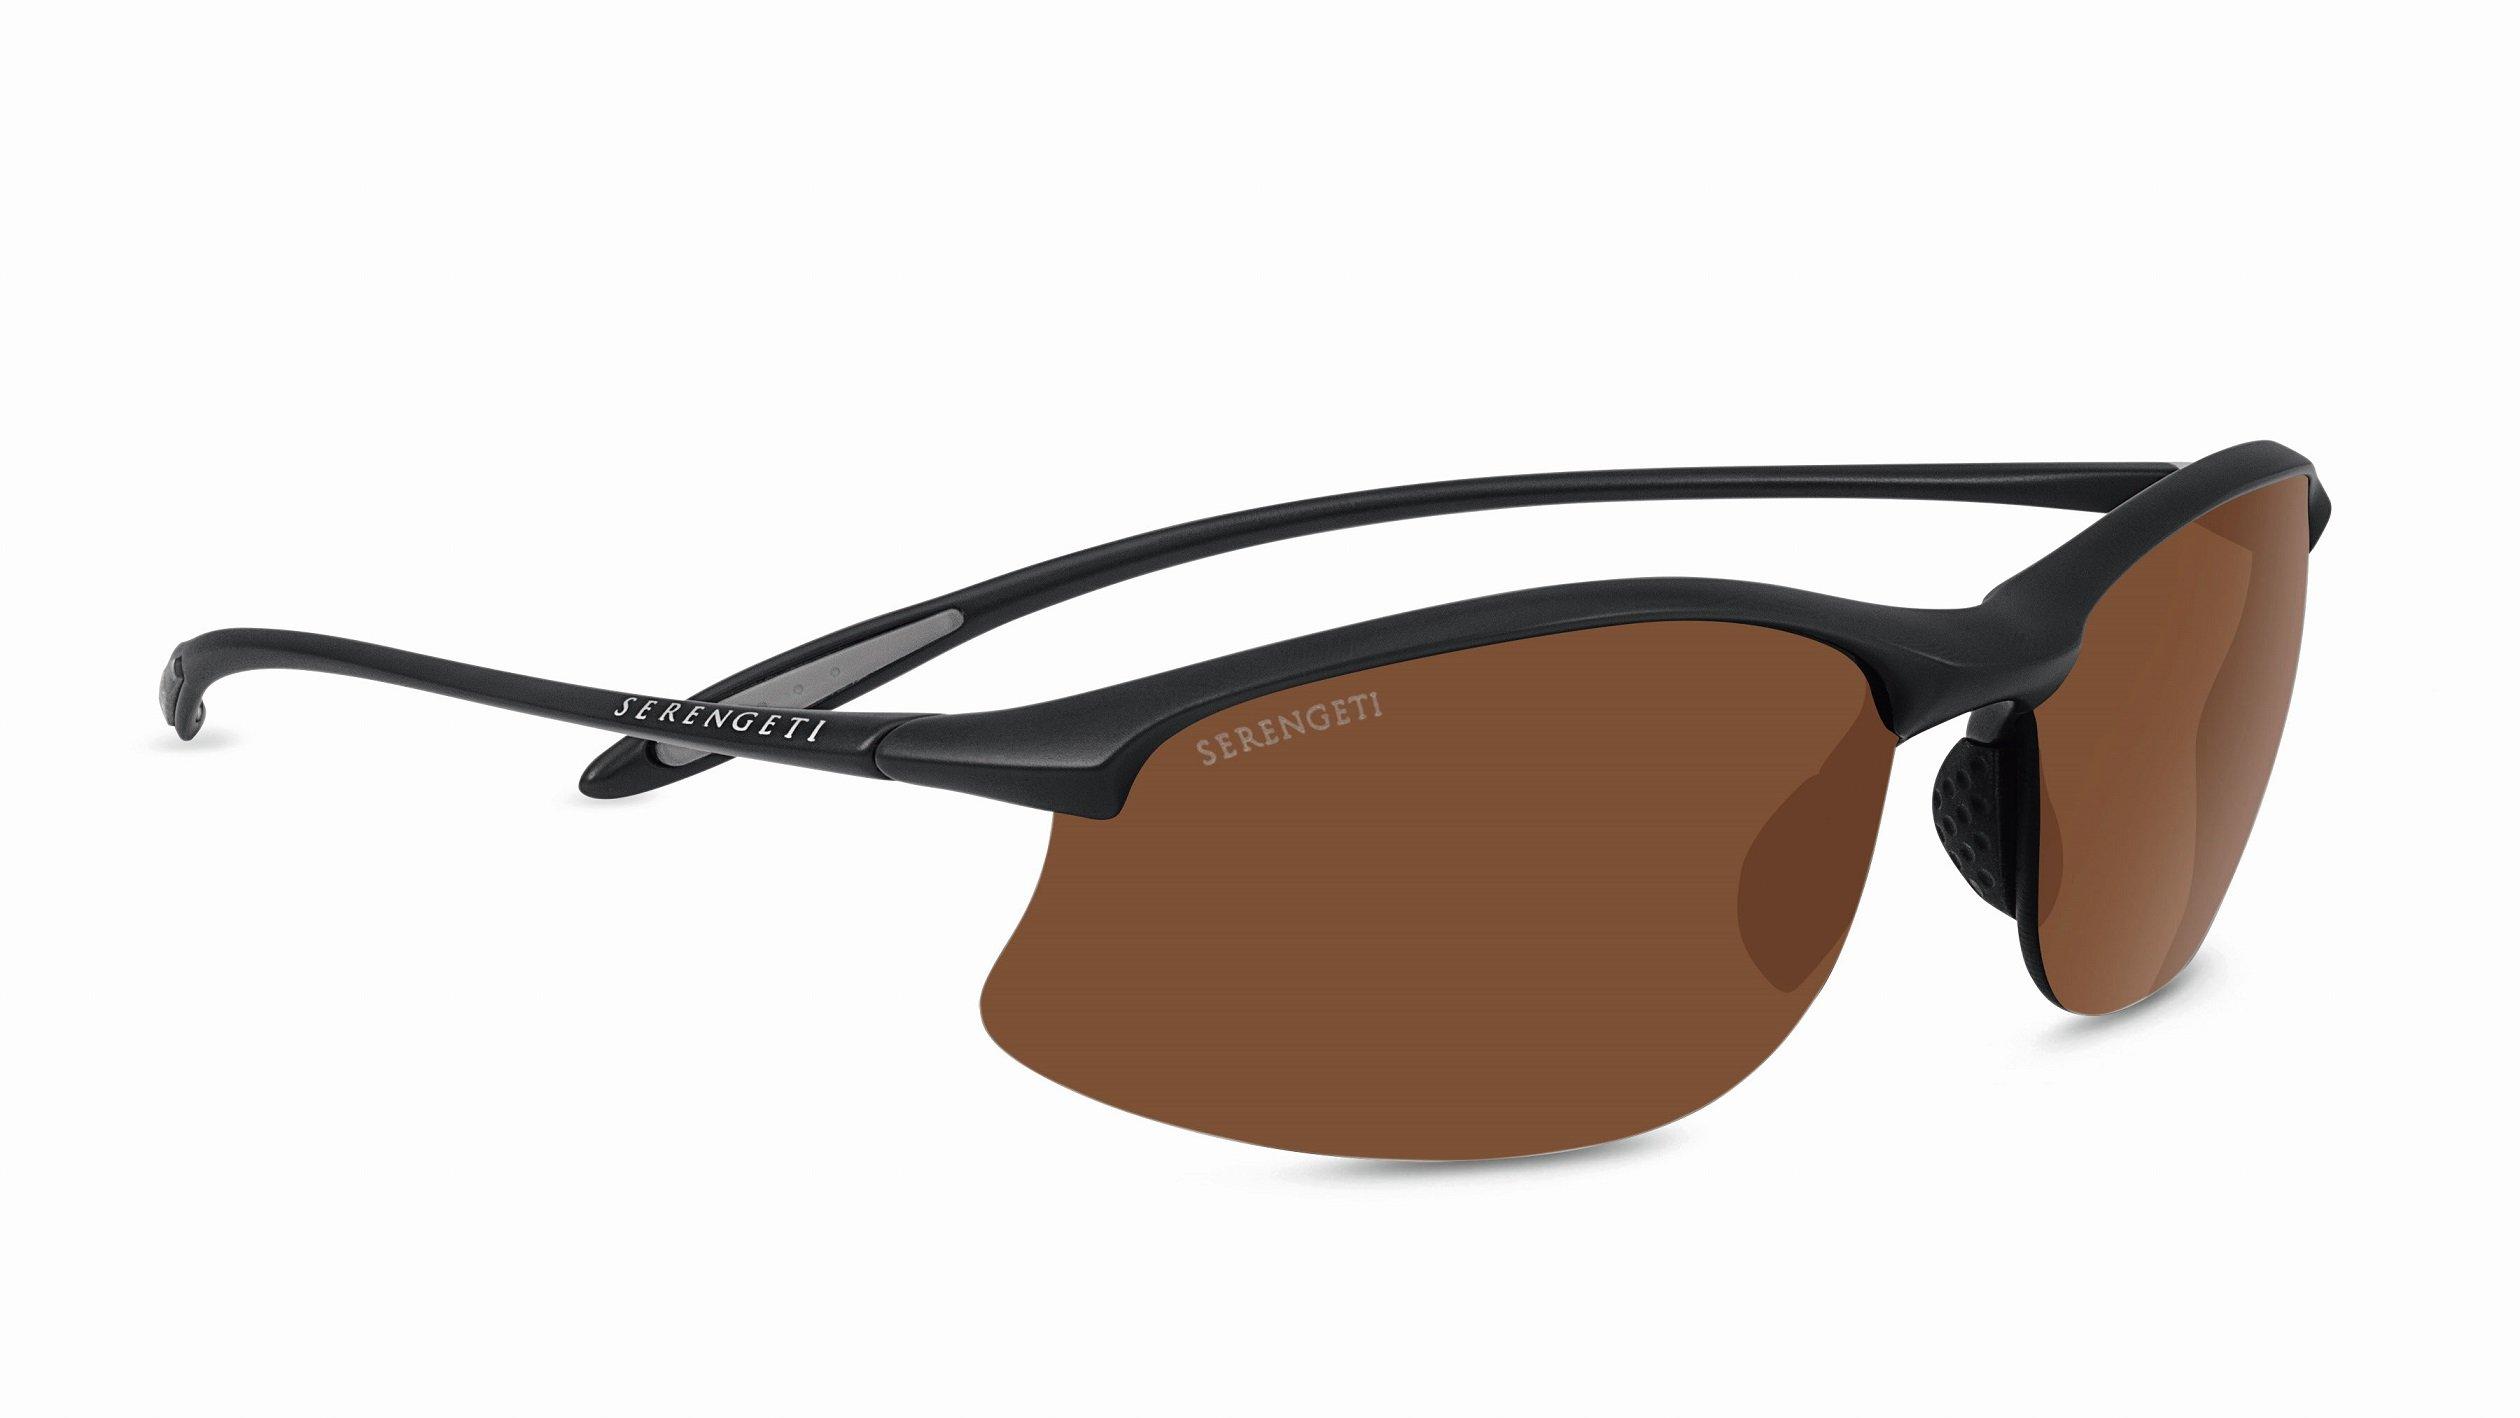 8bd83c25d2d Amazon.com  Serengeti Maestrale Polar Sunglasses